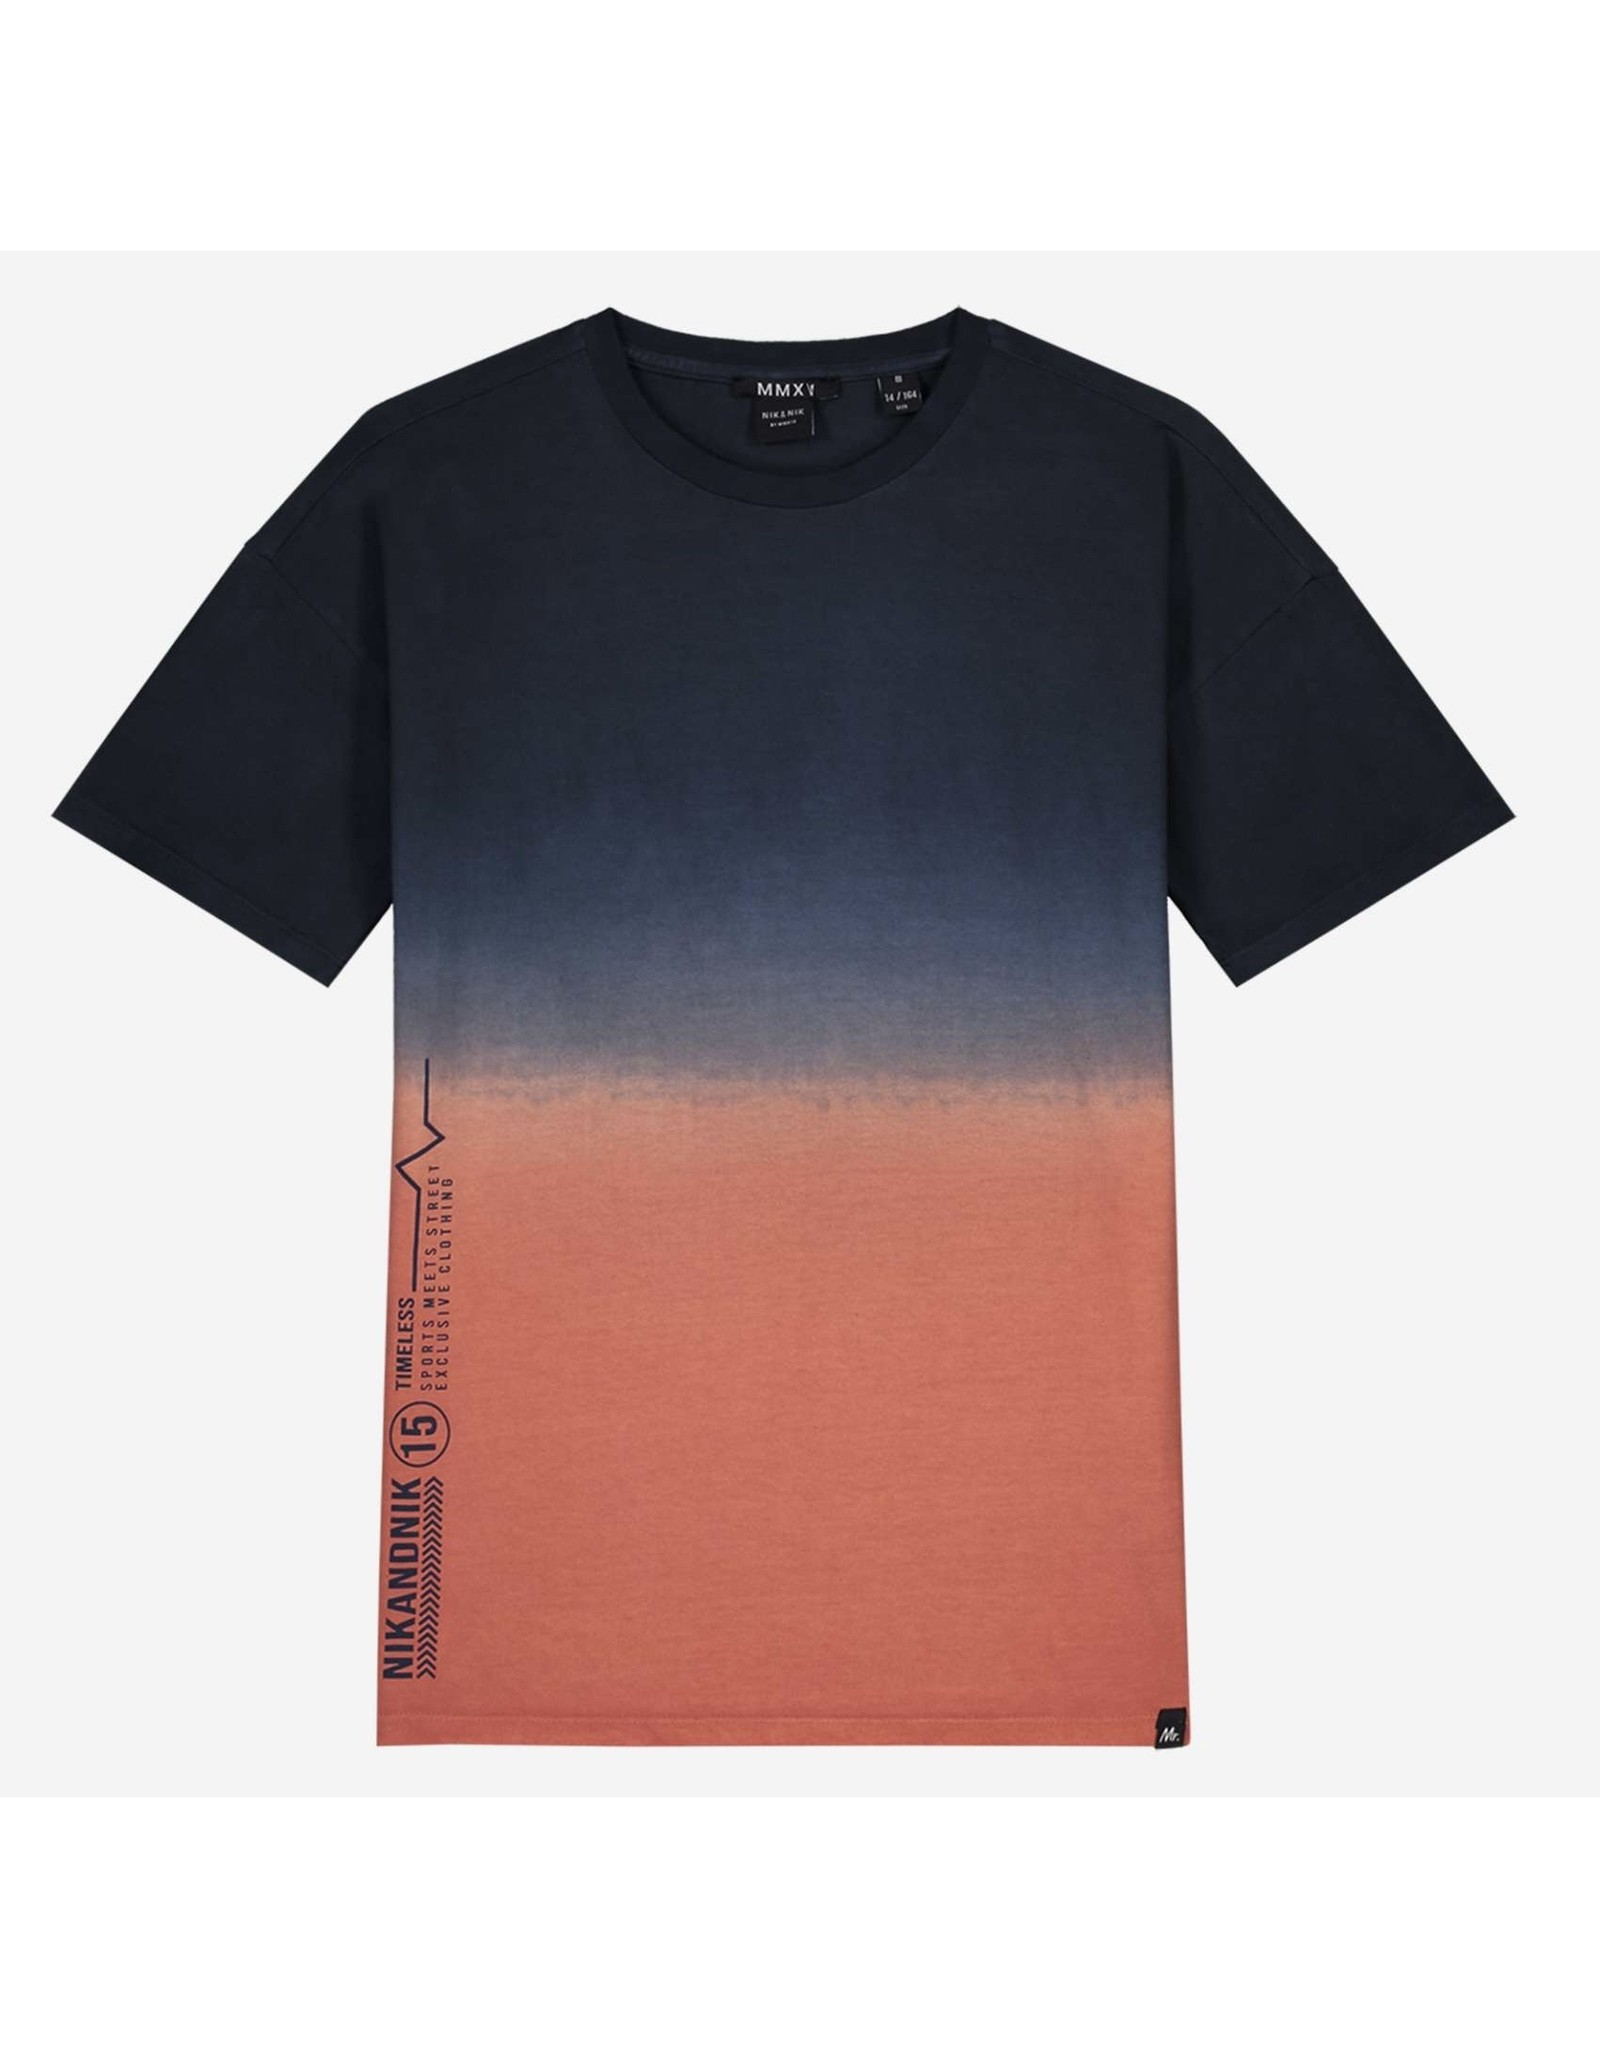 Nik & Nik August T-Shirt